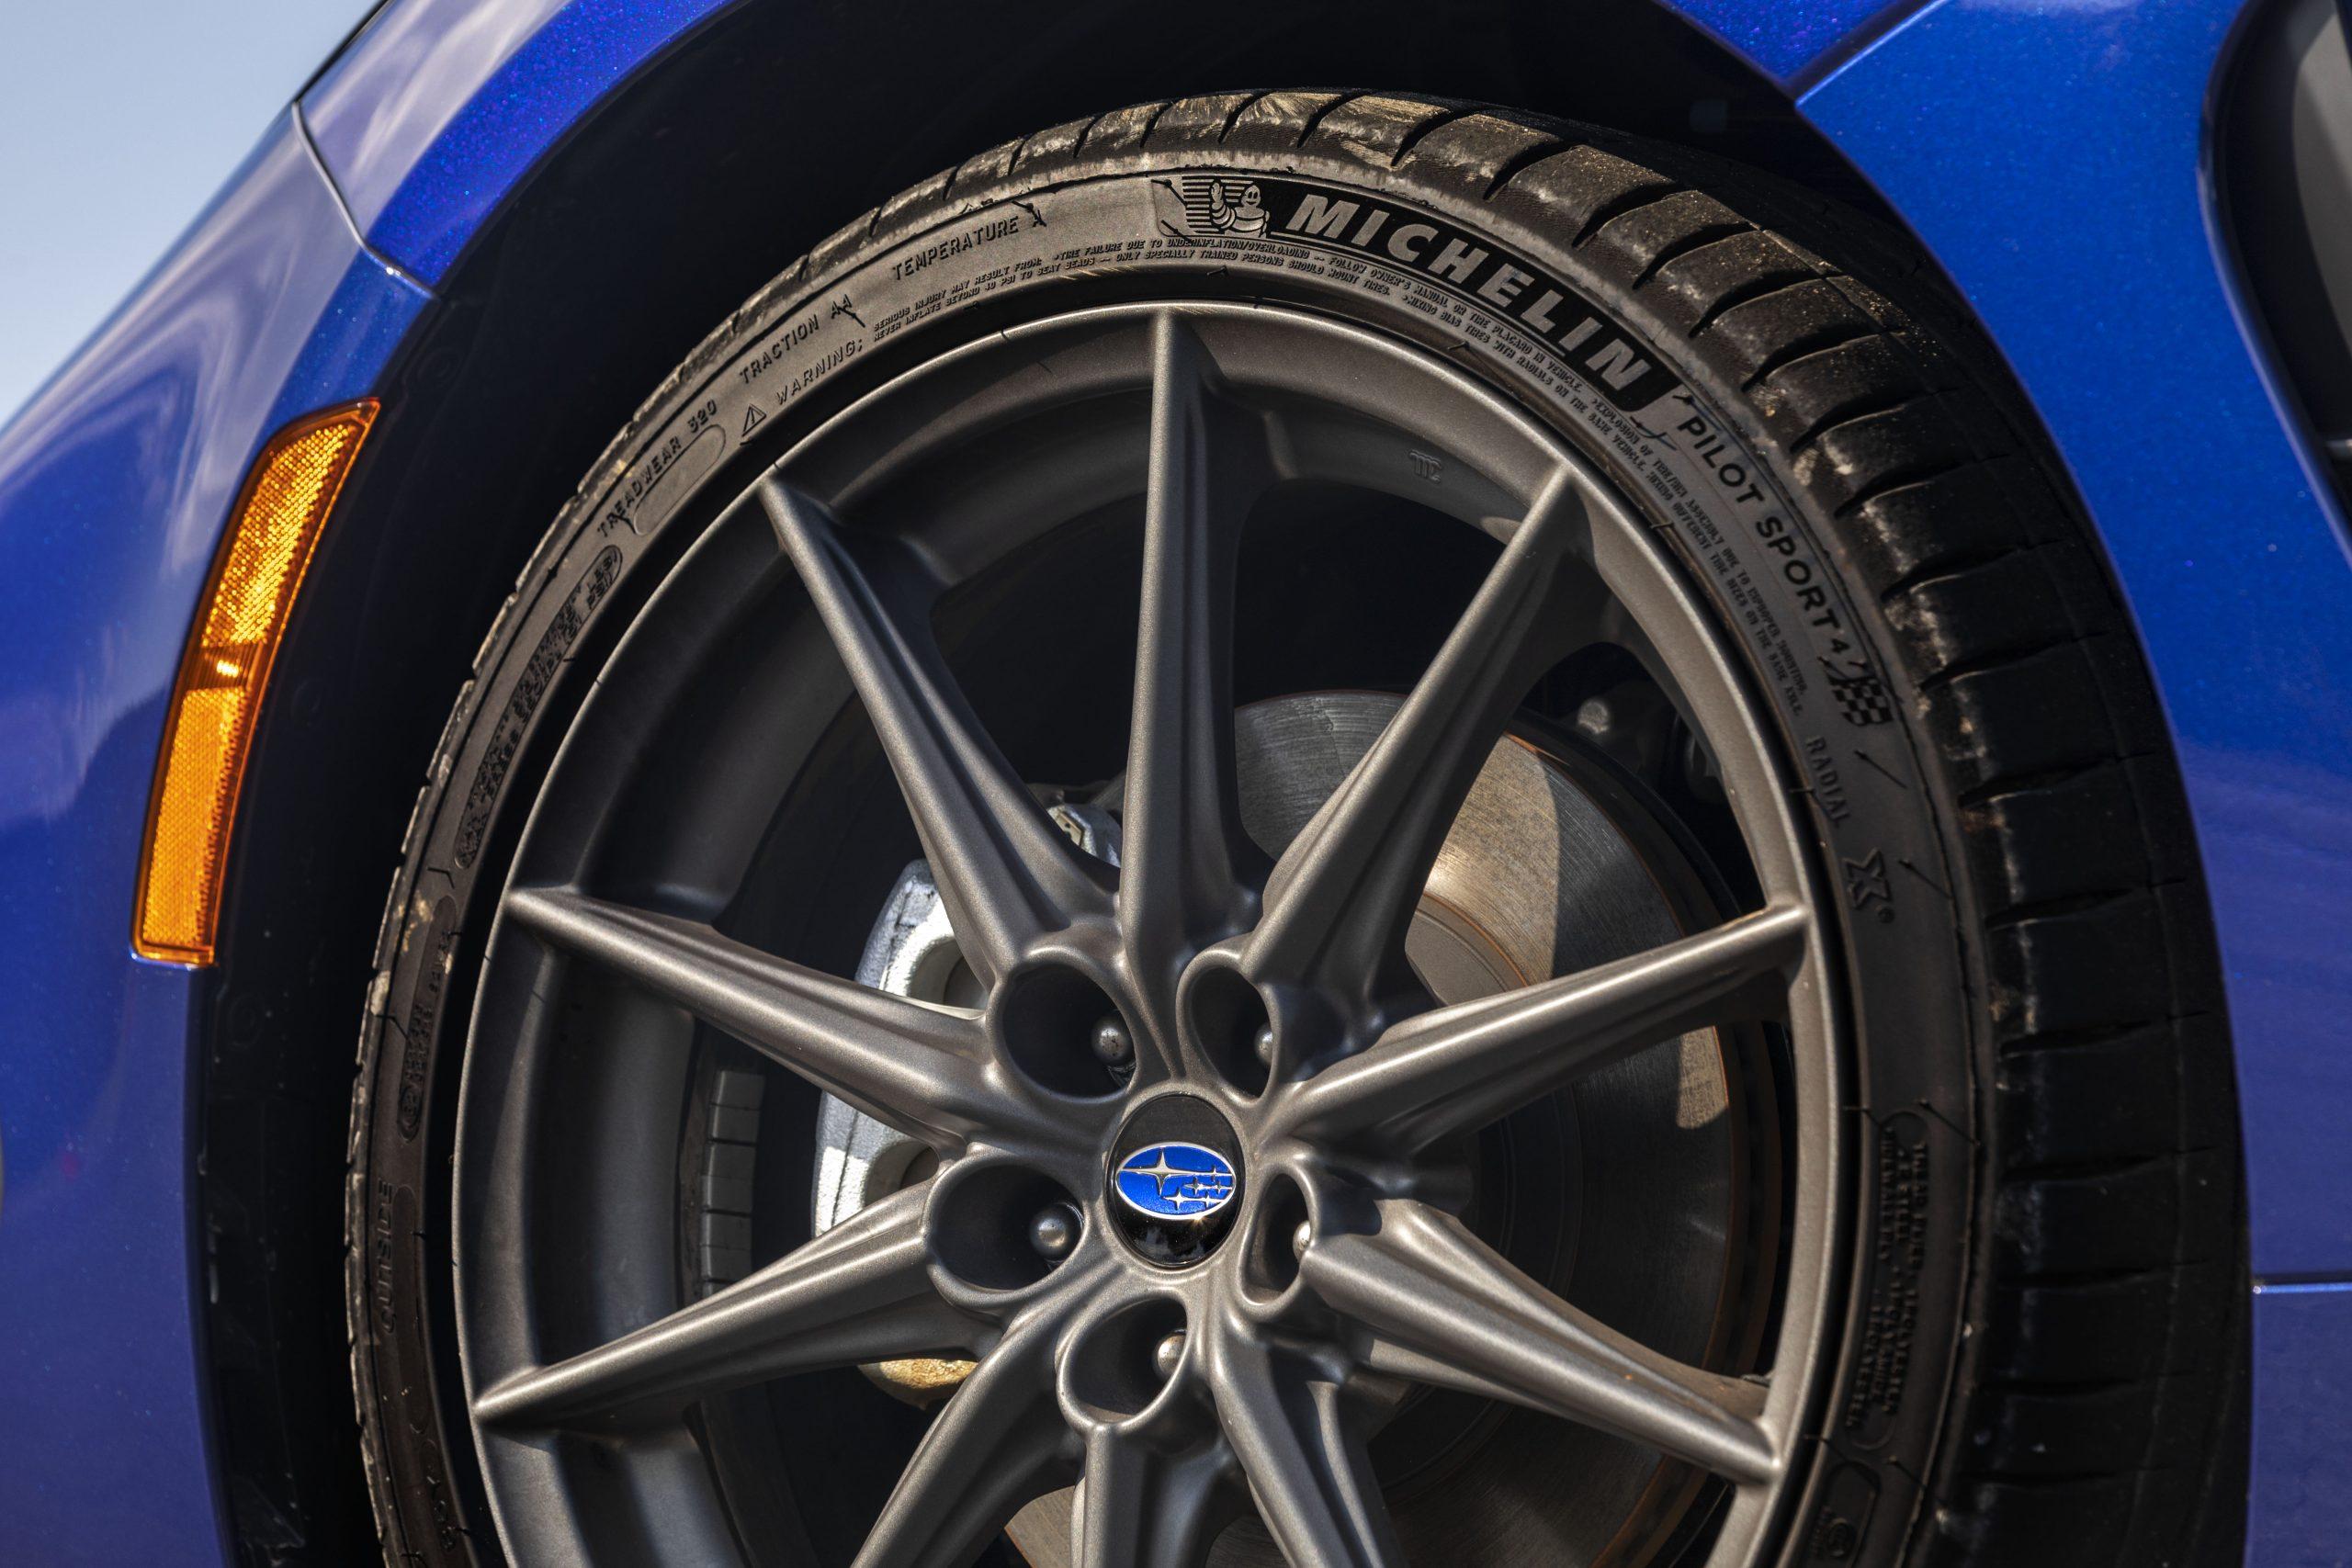 2022 Subaru BRZ wheel tire brake close